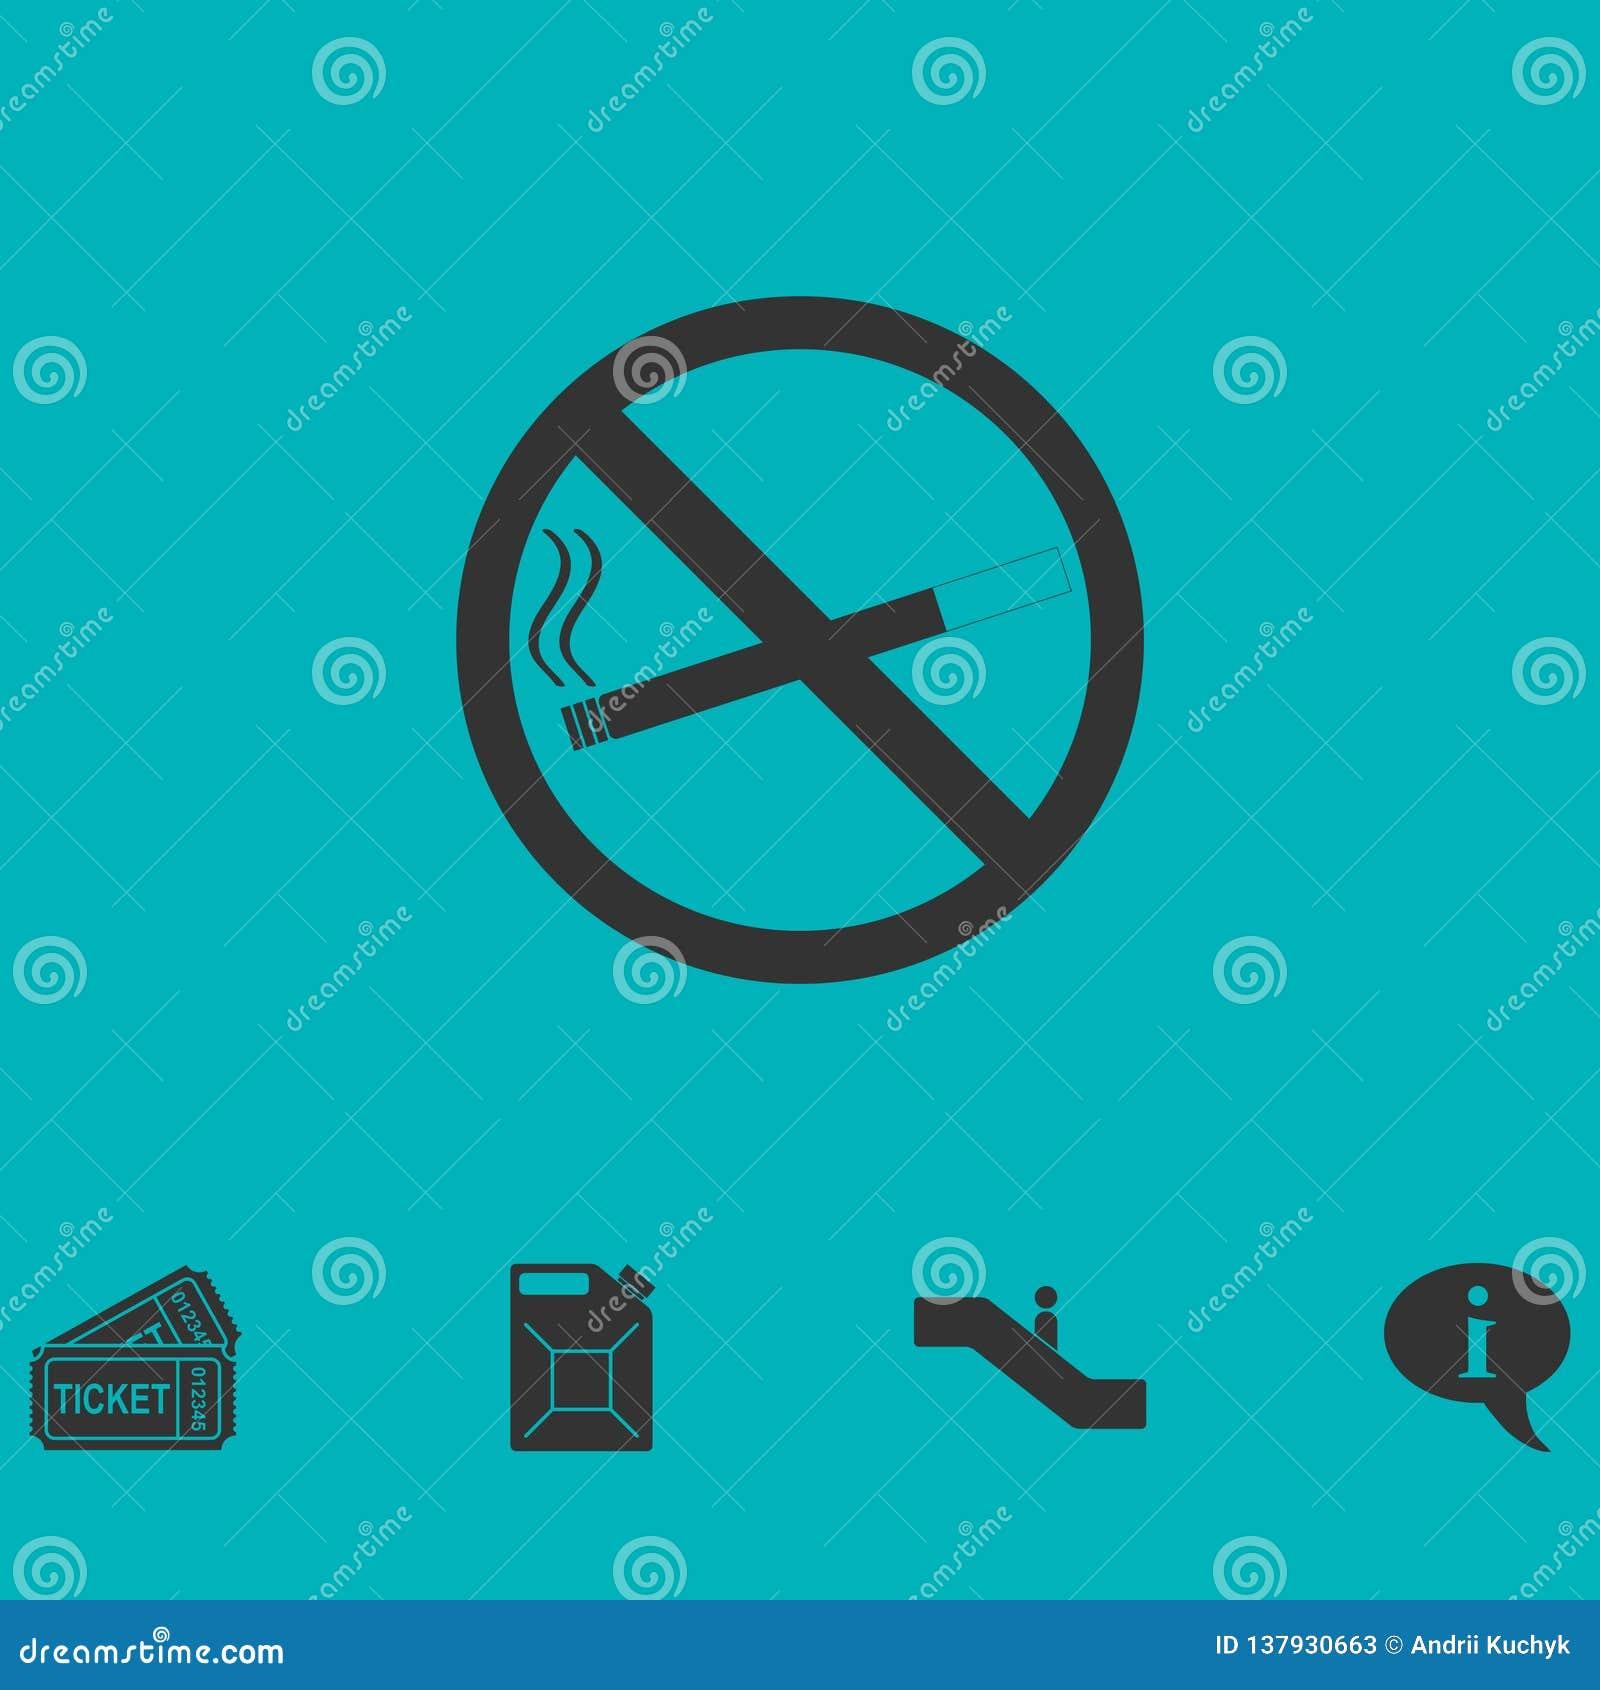 No smoking icon flat